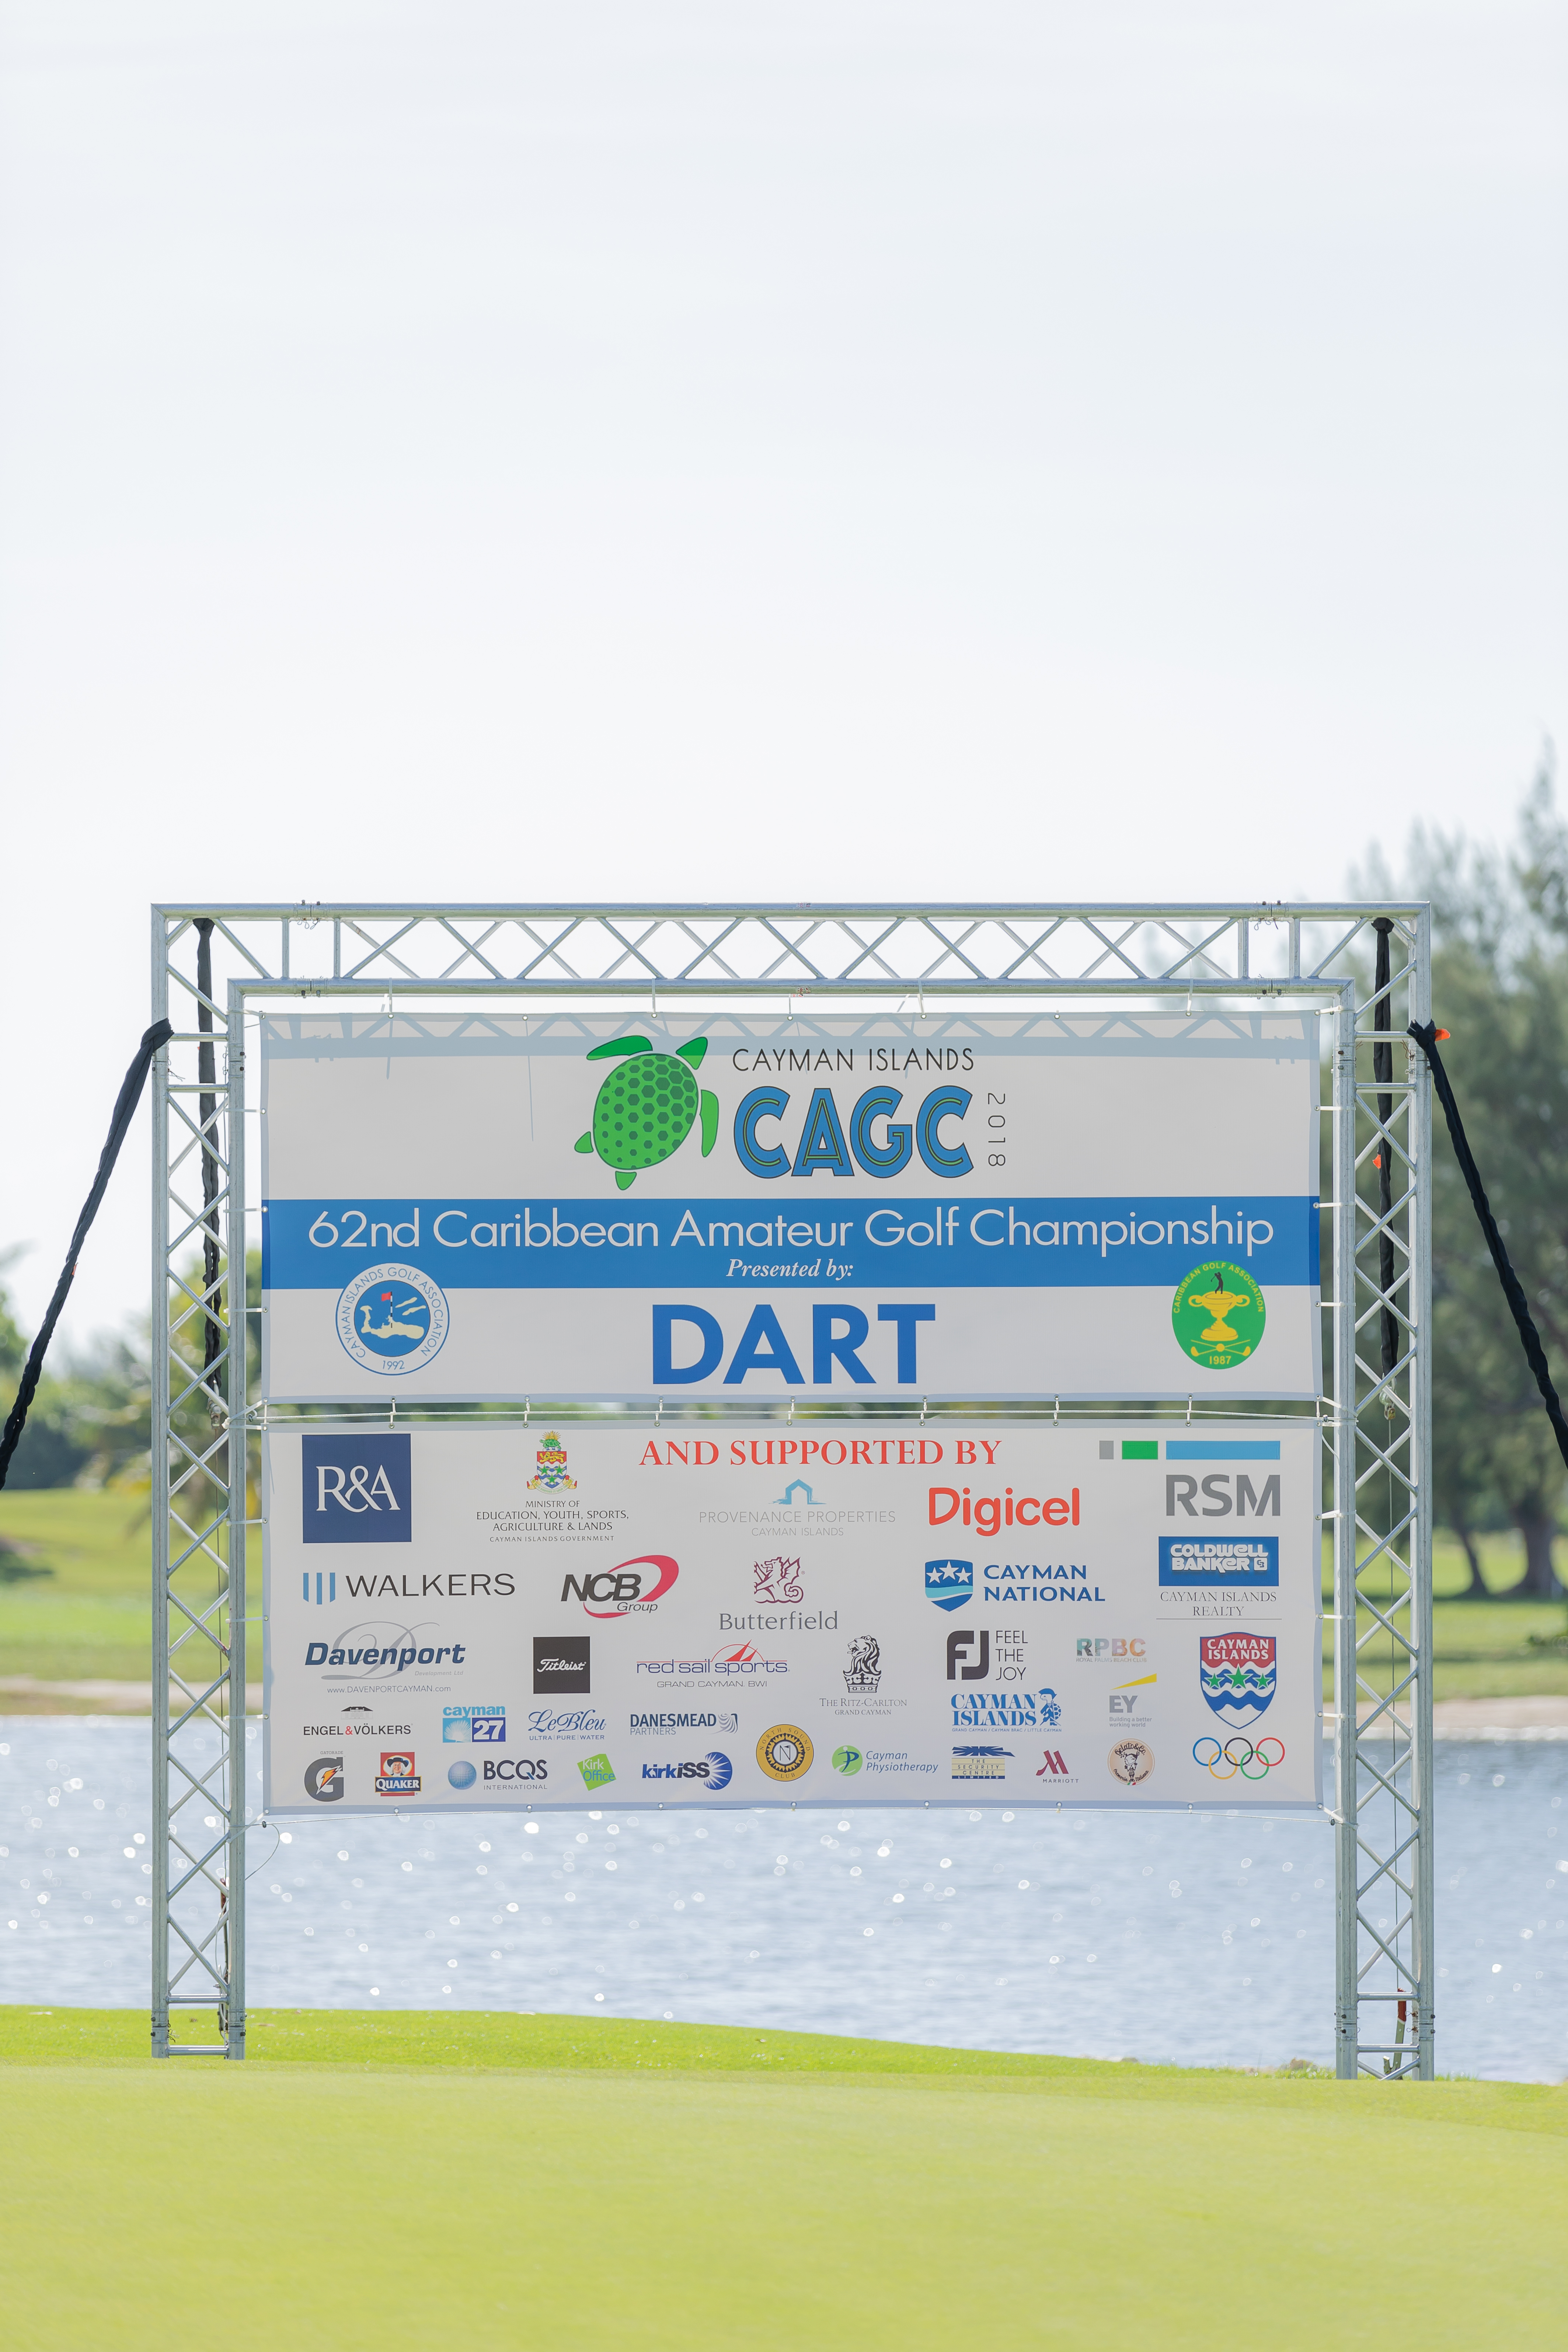 080318-CAGC-4